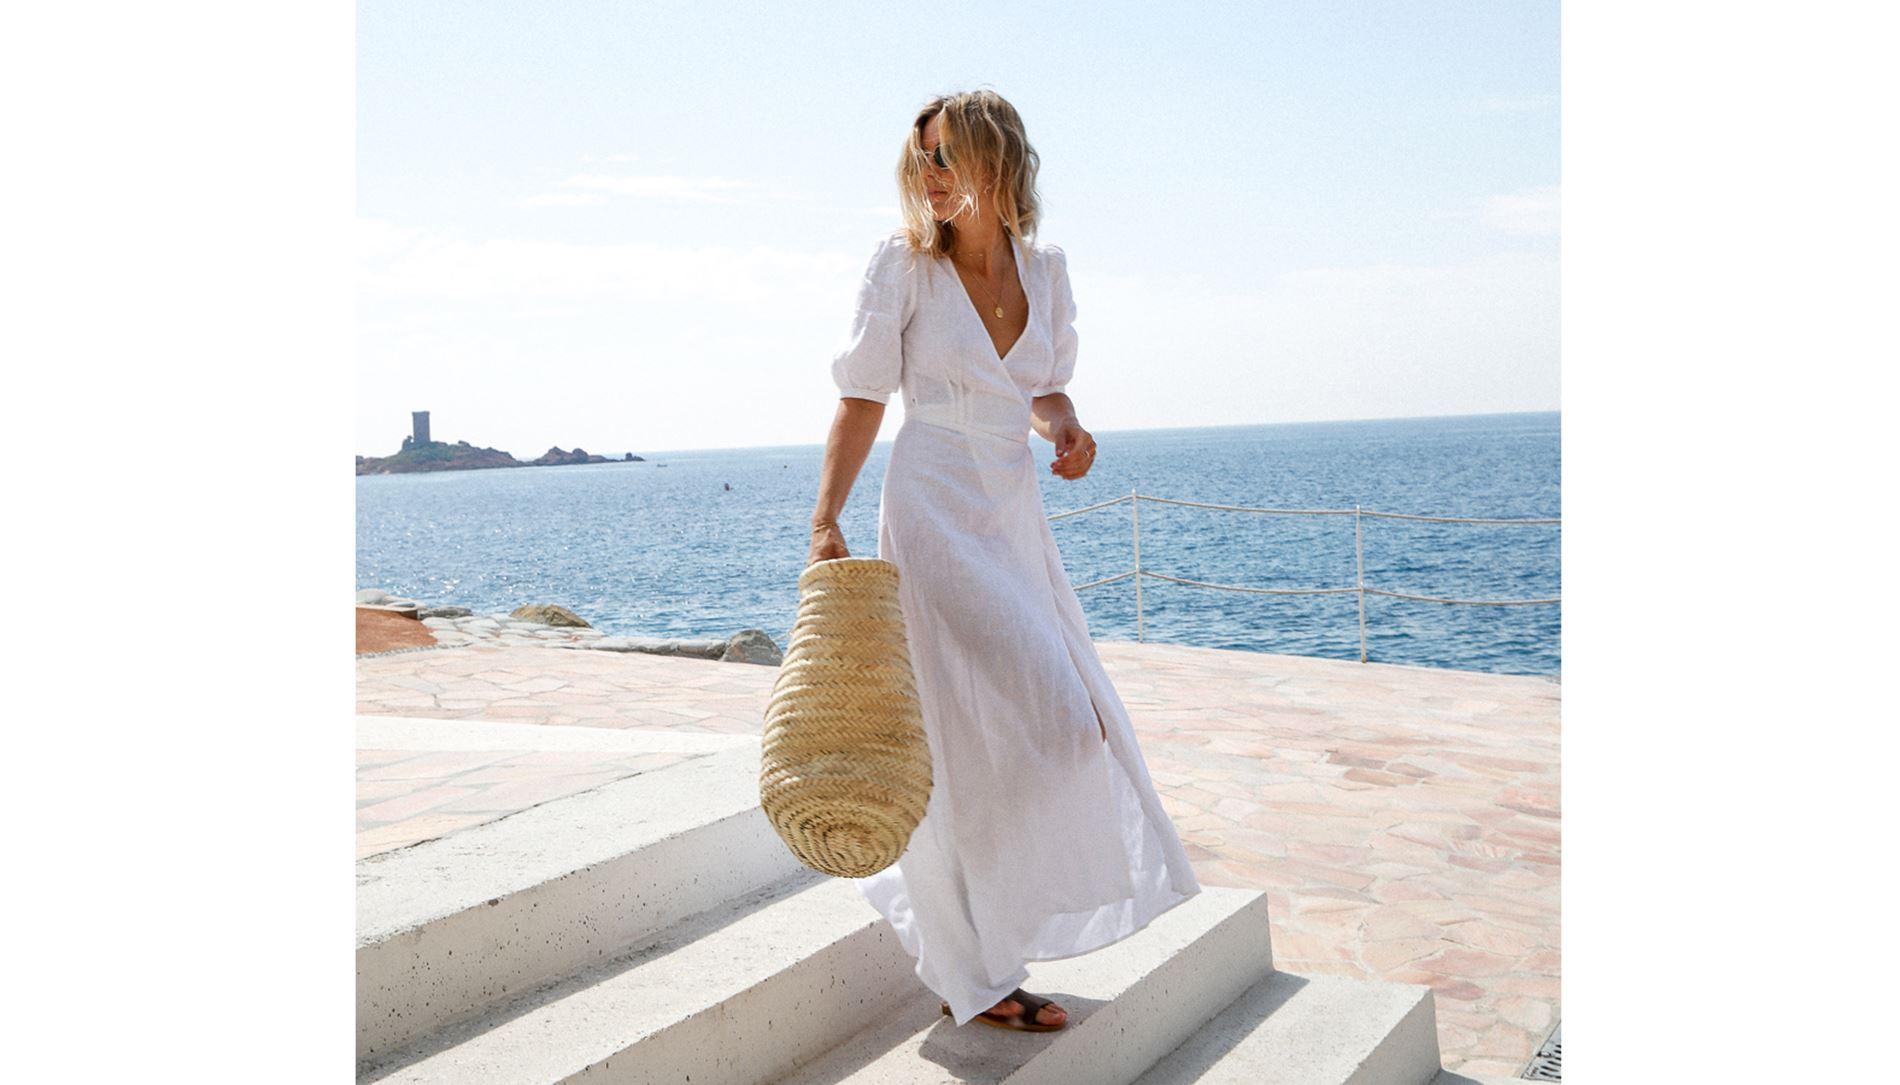 1886d2dd6c8a Λευκό φόρεμα  6 συνδυασμοί με το must-have του καλοκαιριού